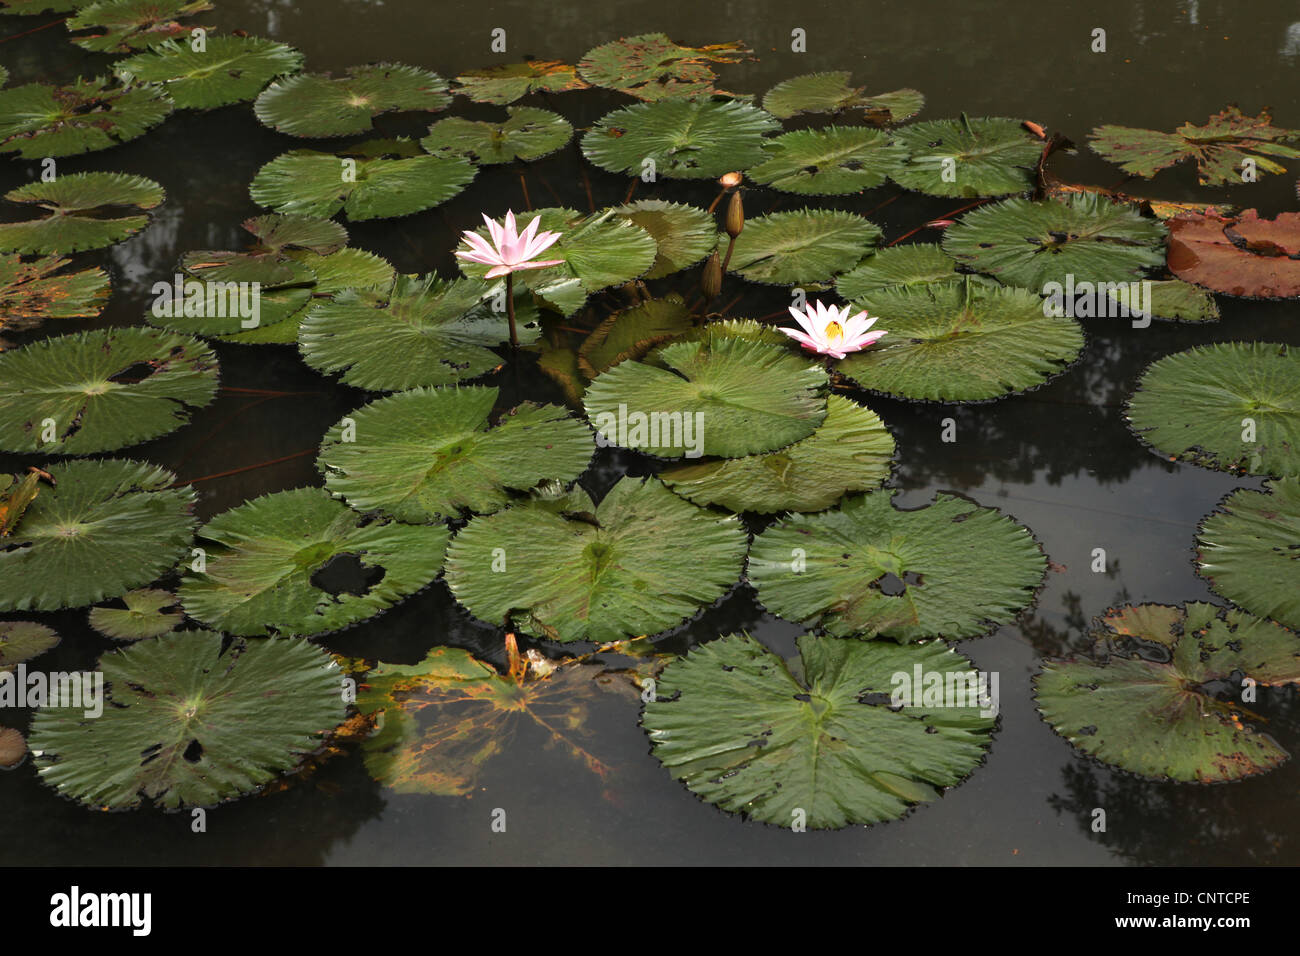 Lotus in the Bogor Botanical Gardens, West Java, Indonesia. - Stock Image